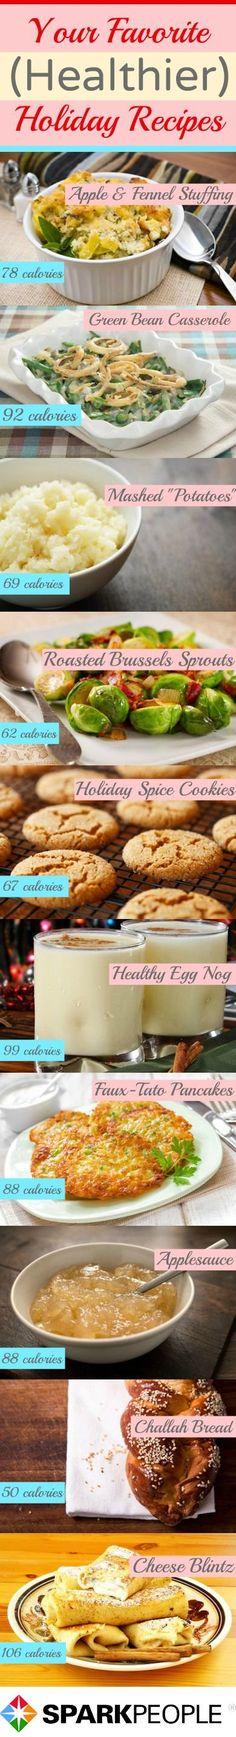 Health(ier) Holiday Favorites   via @SparkPeople #recipe #food